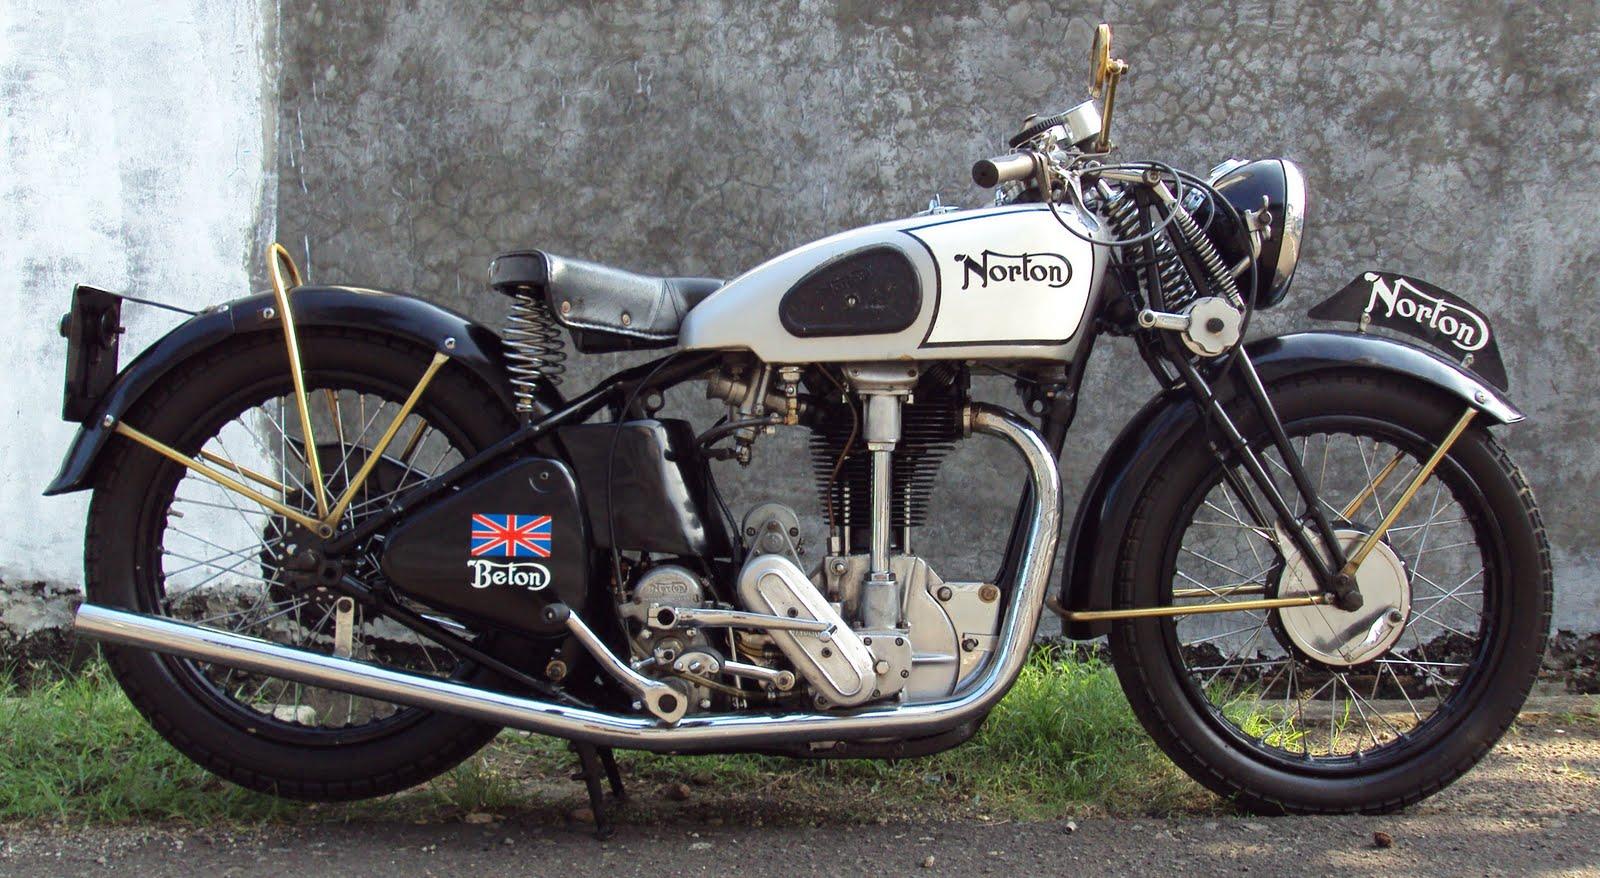 Vintage Norton Motorcycles C1937 596cc Overhead Camshaft